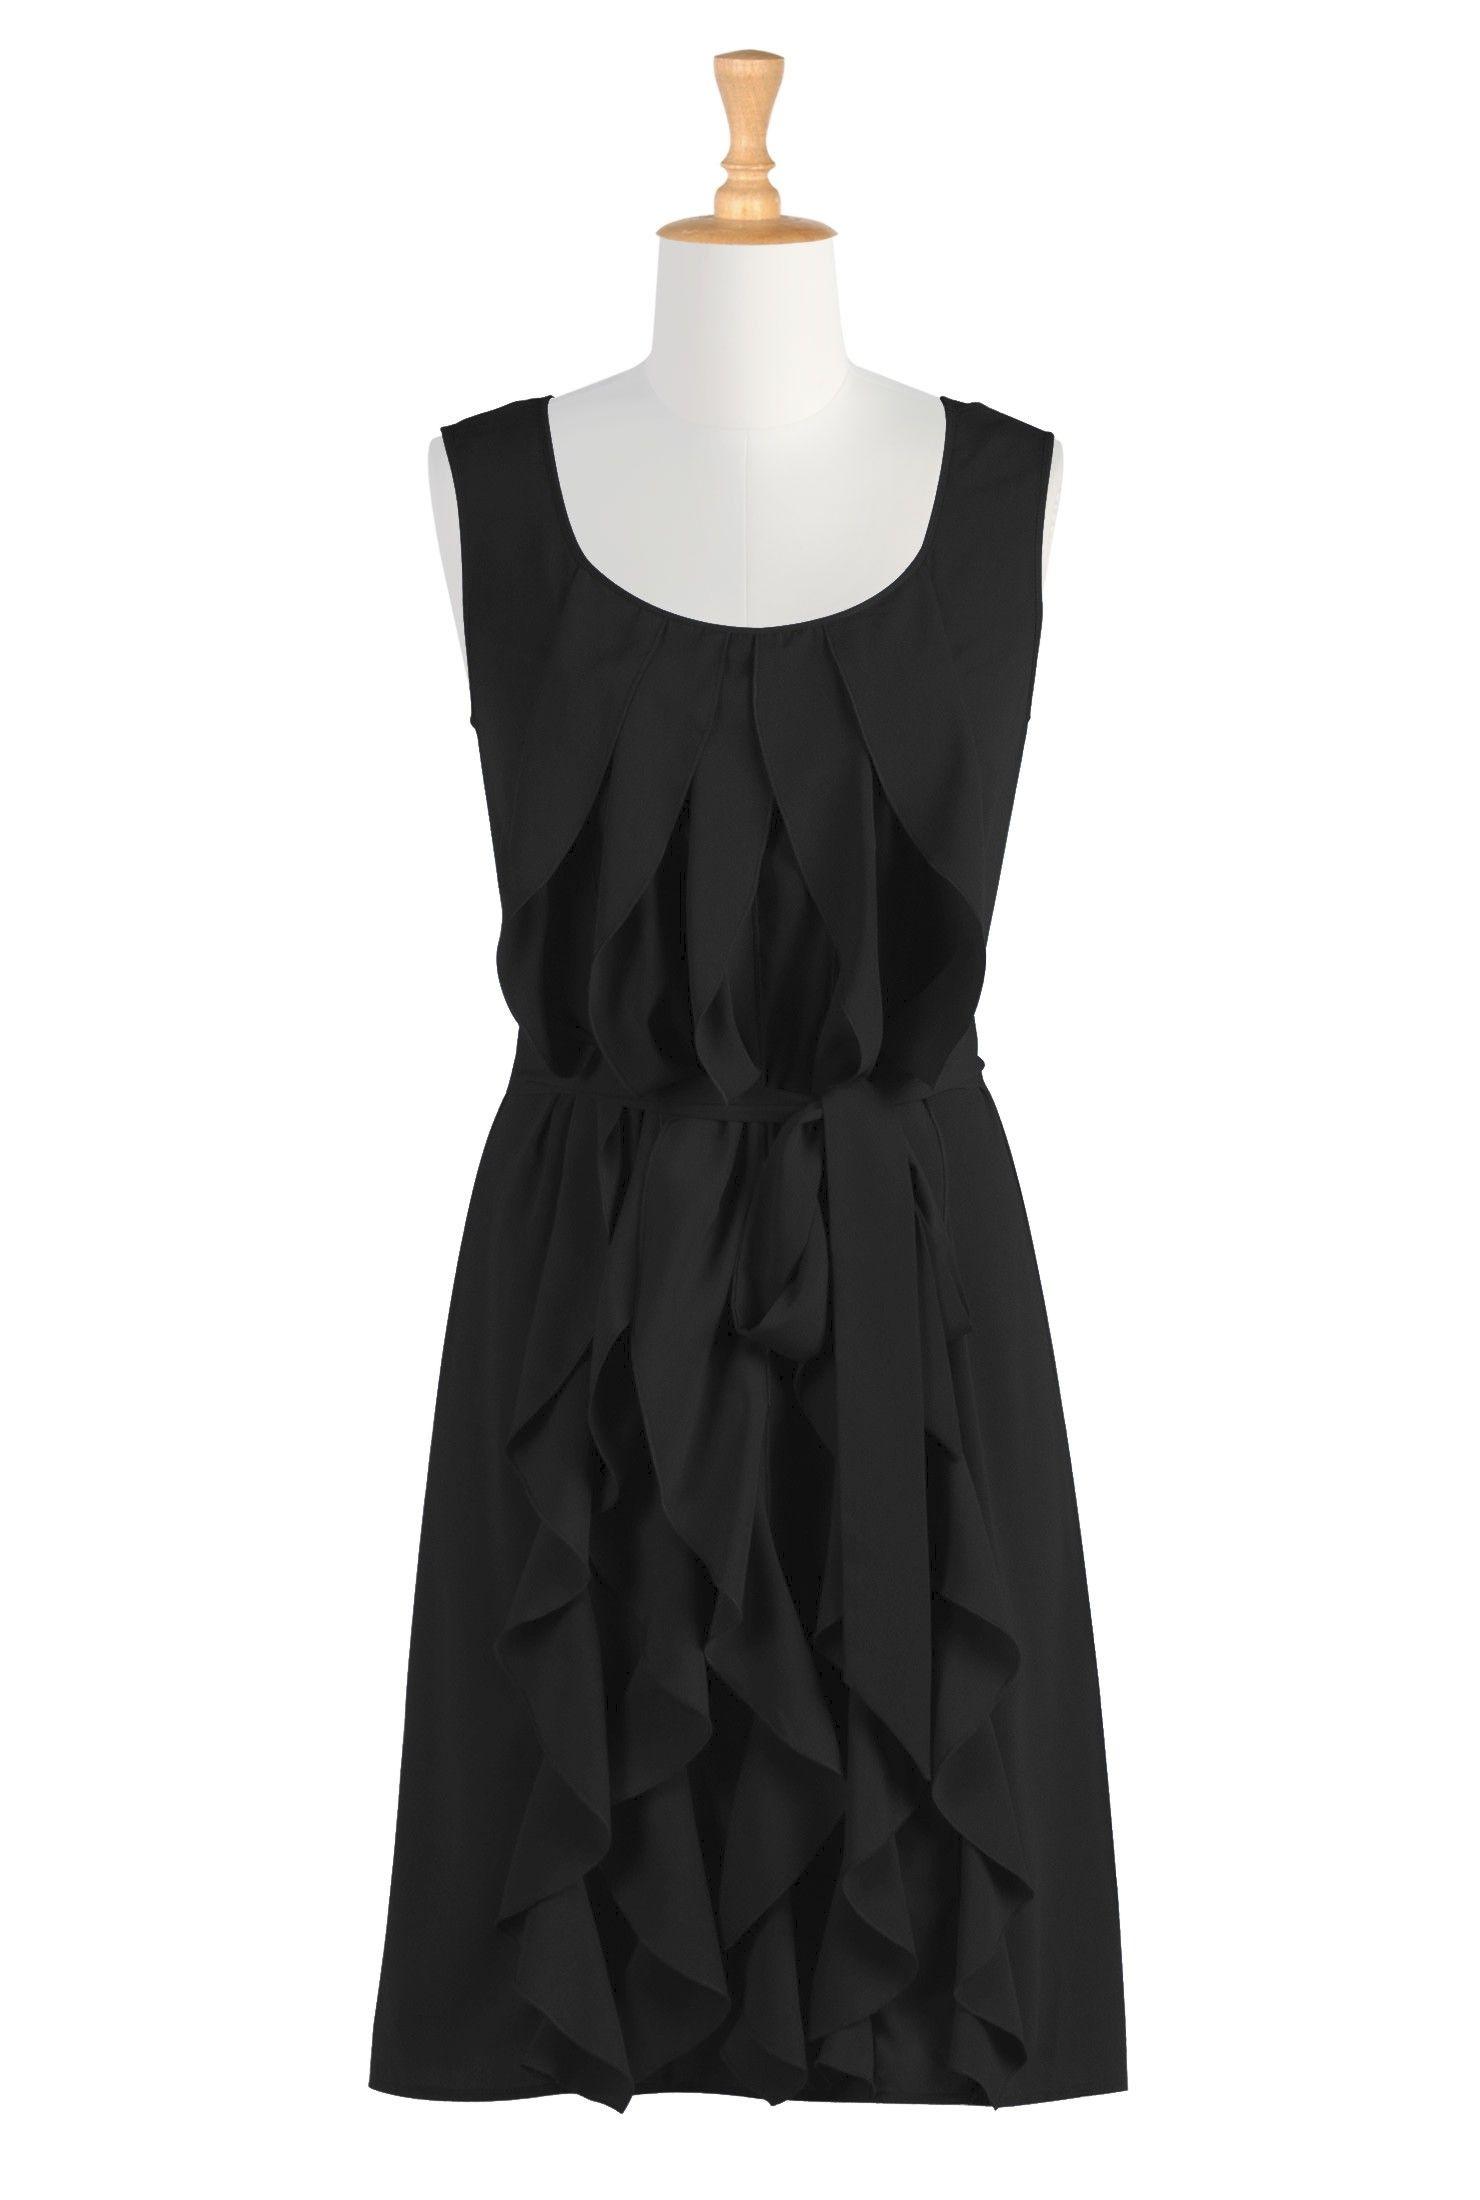 Eshakti shop womenus designer fashion dresses tops size w